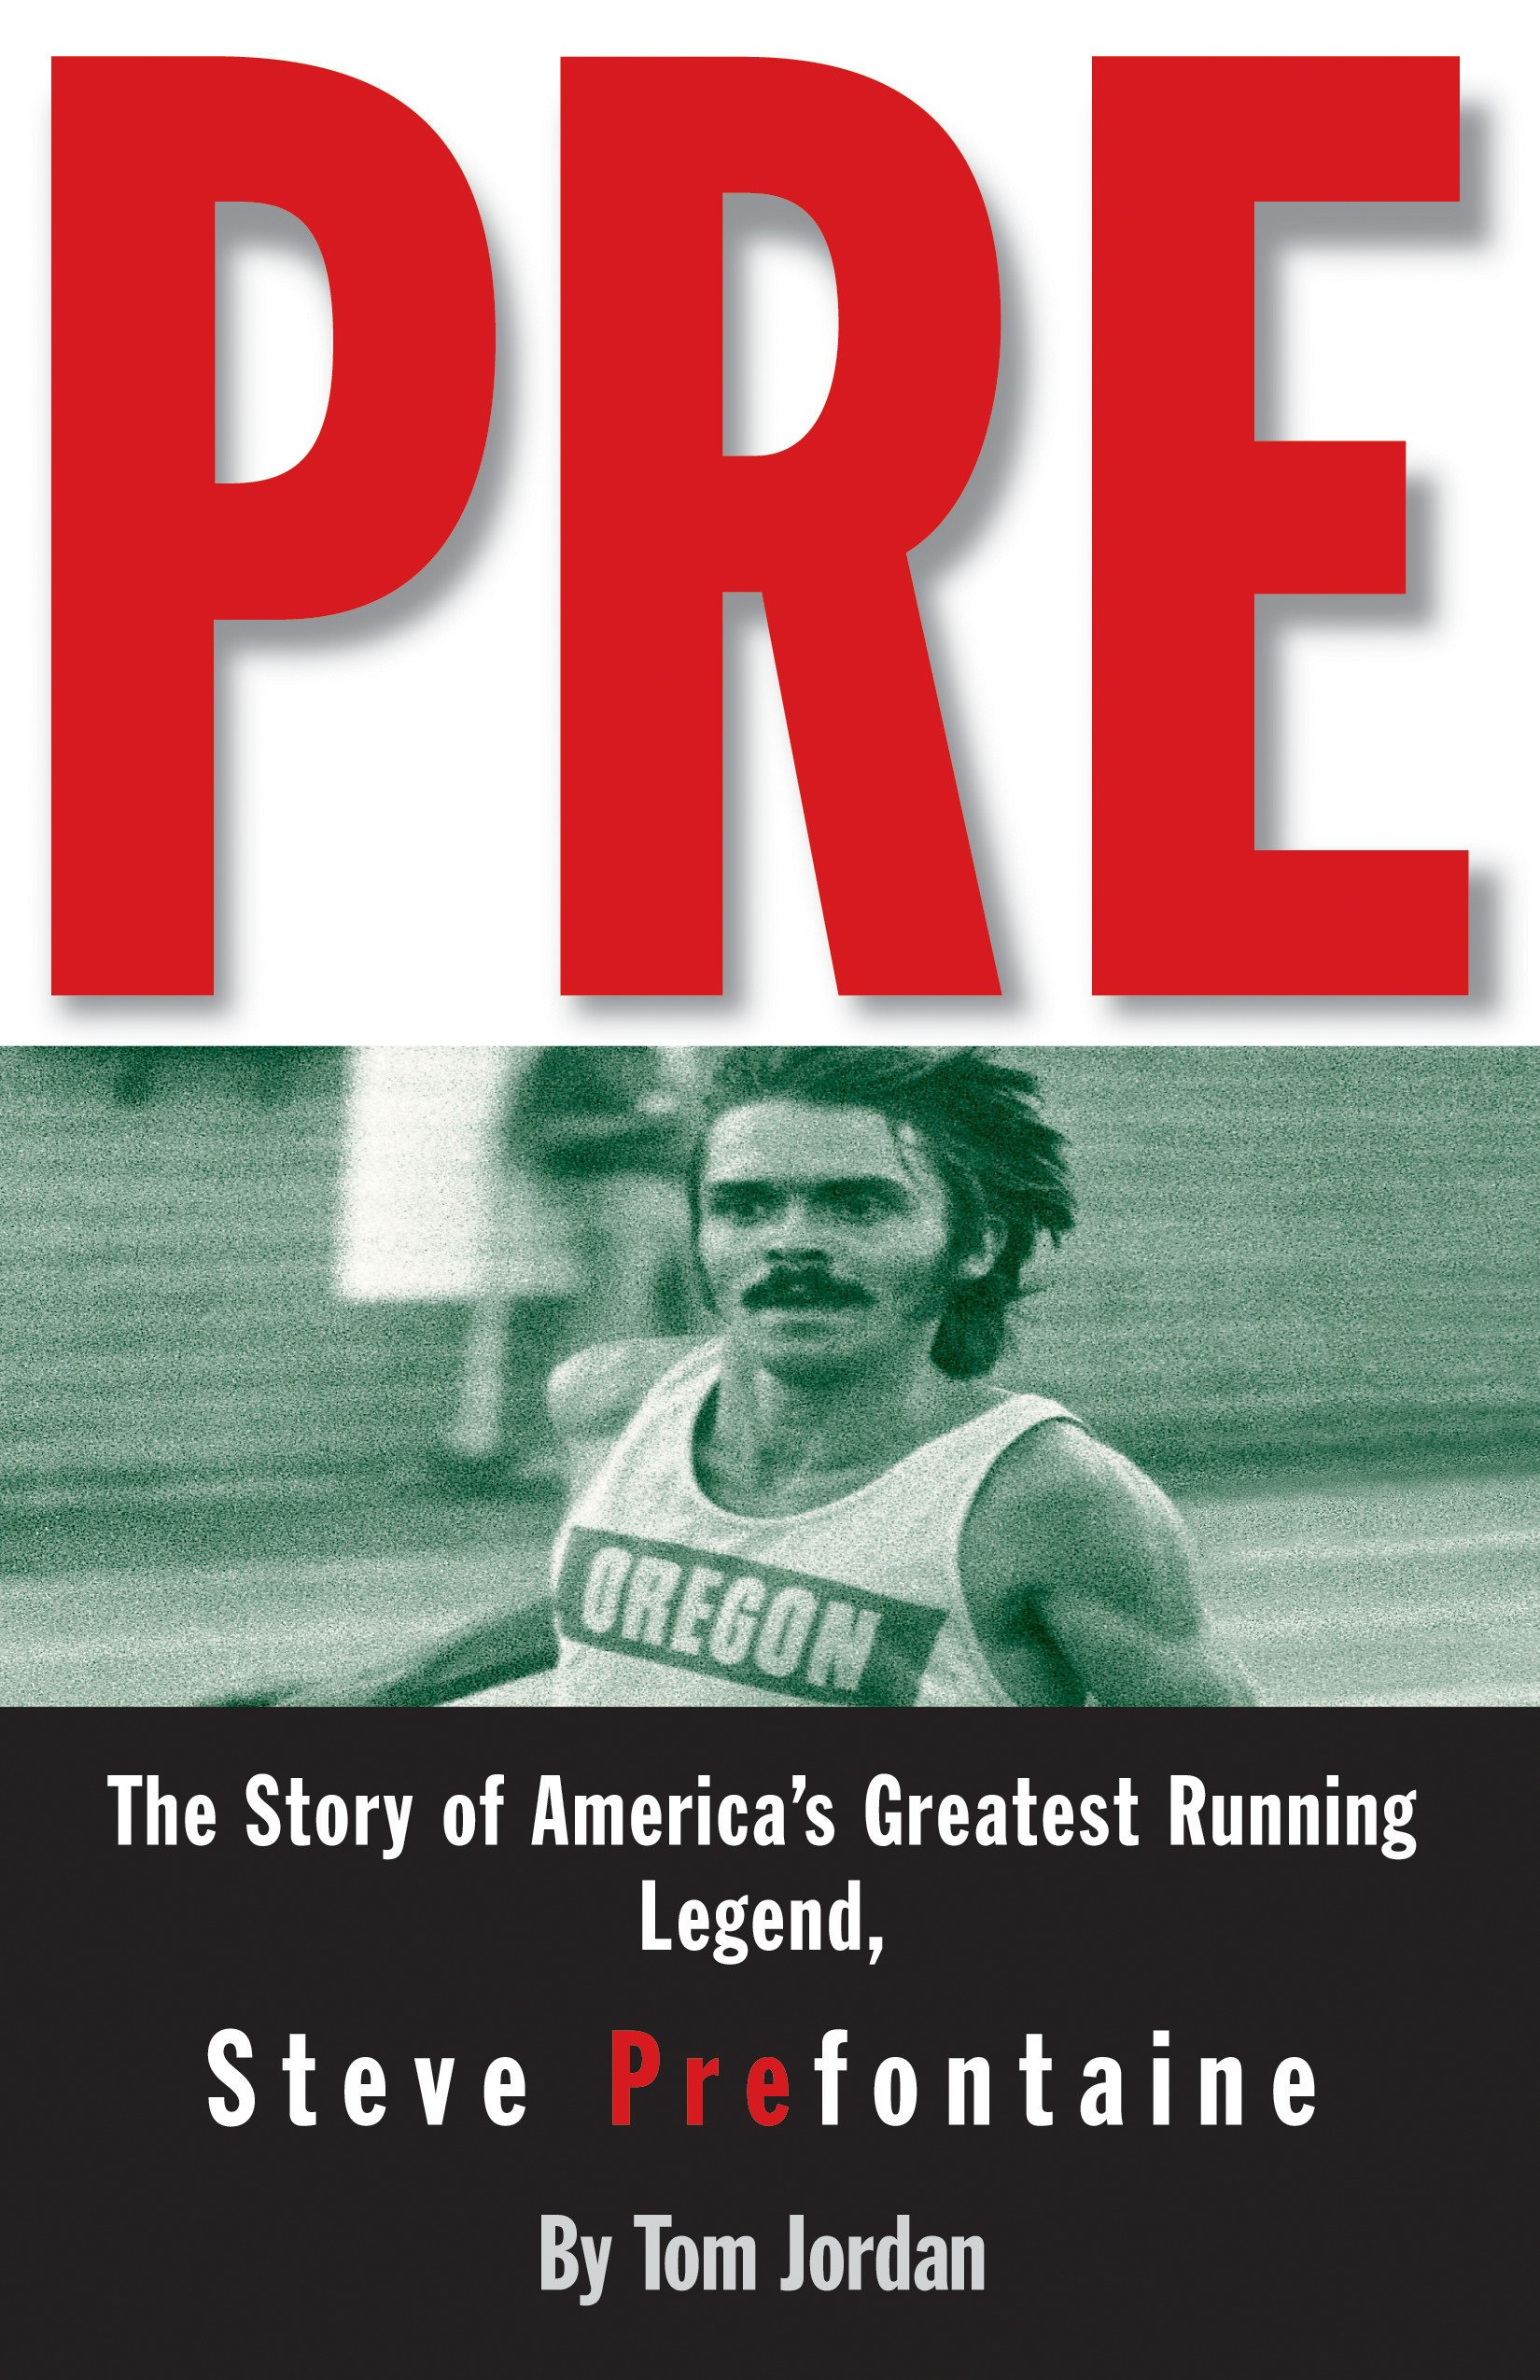 Amazon.com: Pre: The Story of America's Greatest Running Legend, Steve  Prefontaine (9780875964577): Tom Jordan: Books